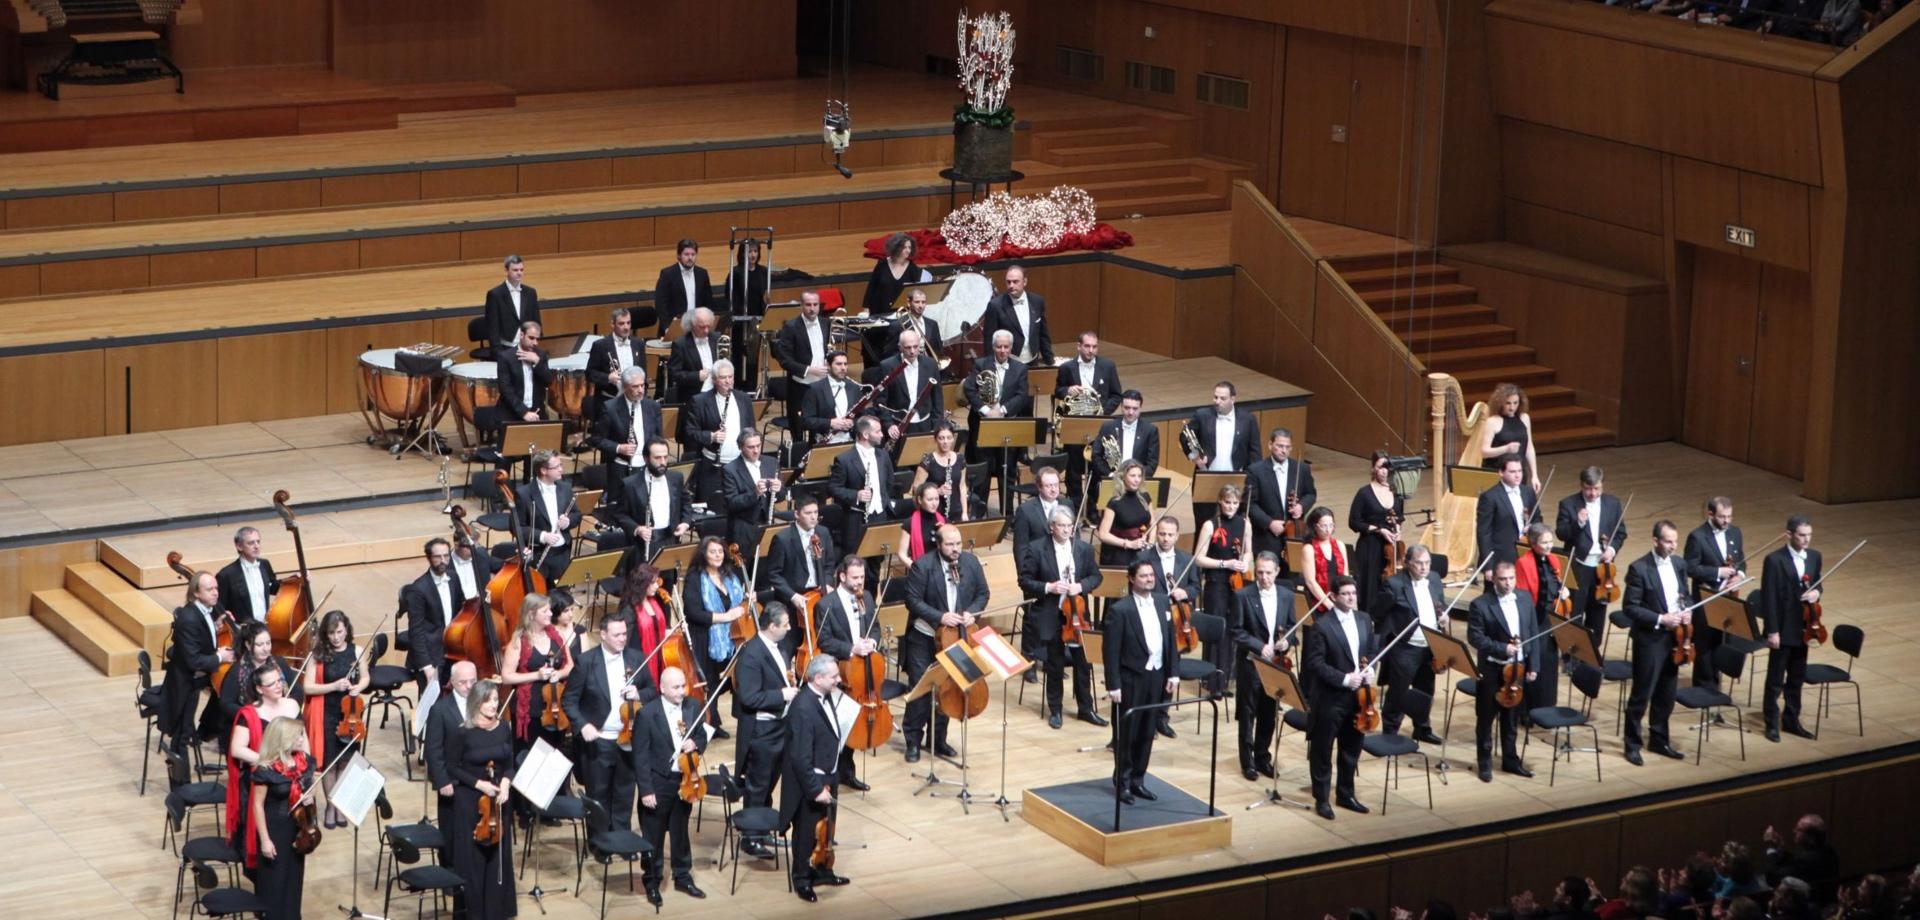 Eoρταστικό γκαλά με την Κρατική Ορχήστρα Αθηνών στο Μέγαρο Μουσικής Αθηνών ecda6831e74